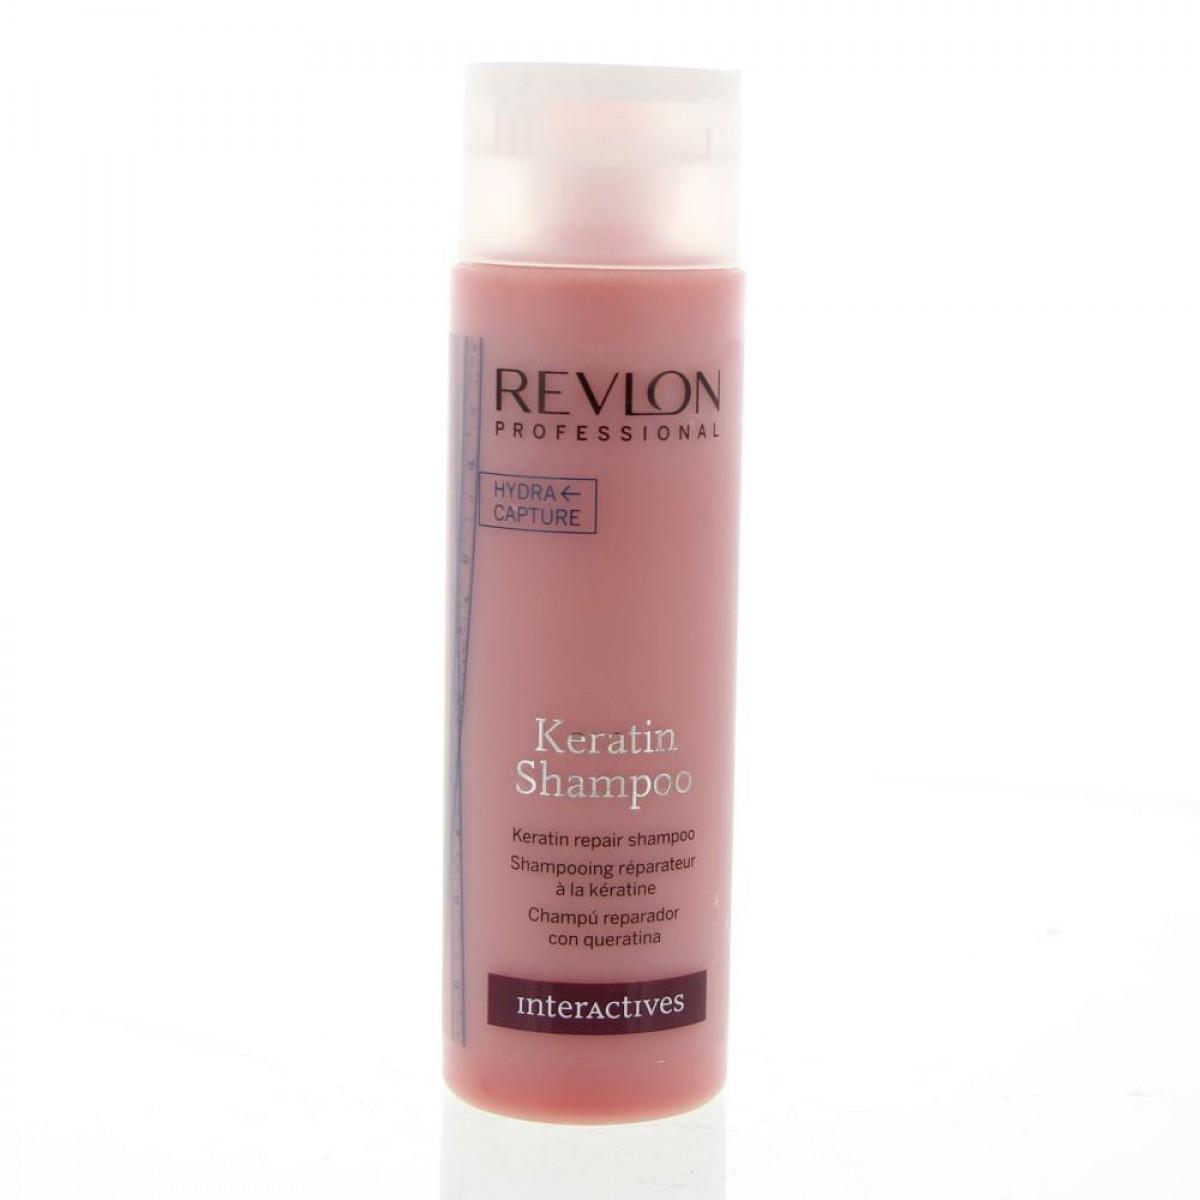 REVLON PROFESSIONAL Interactives Keratin Shampoo 250ml